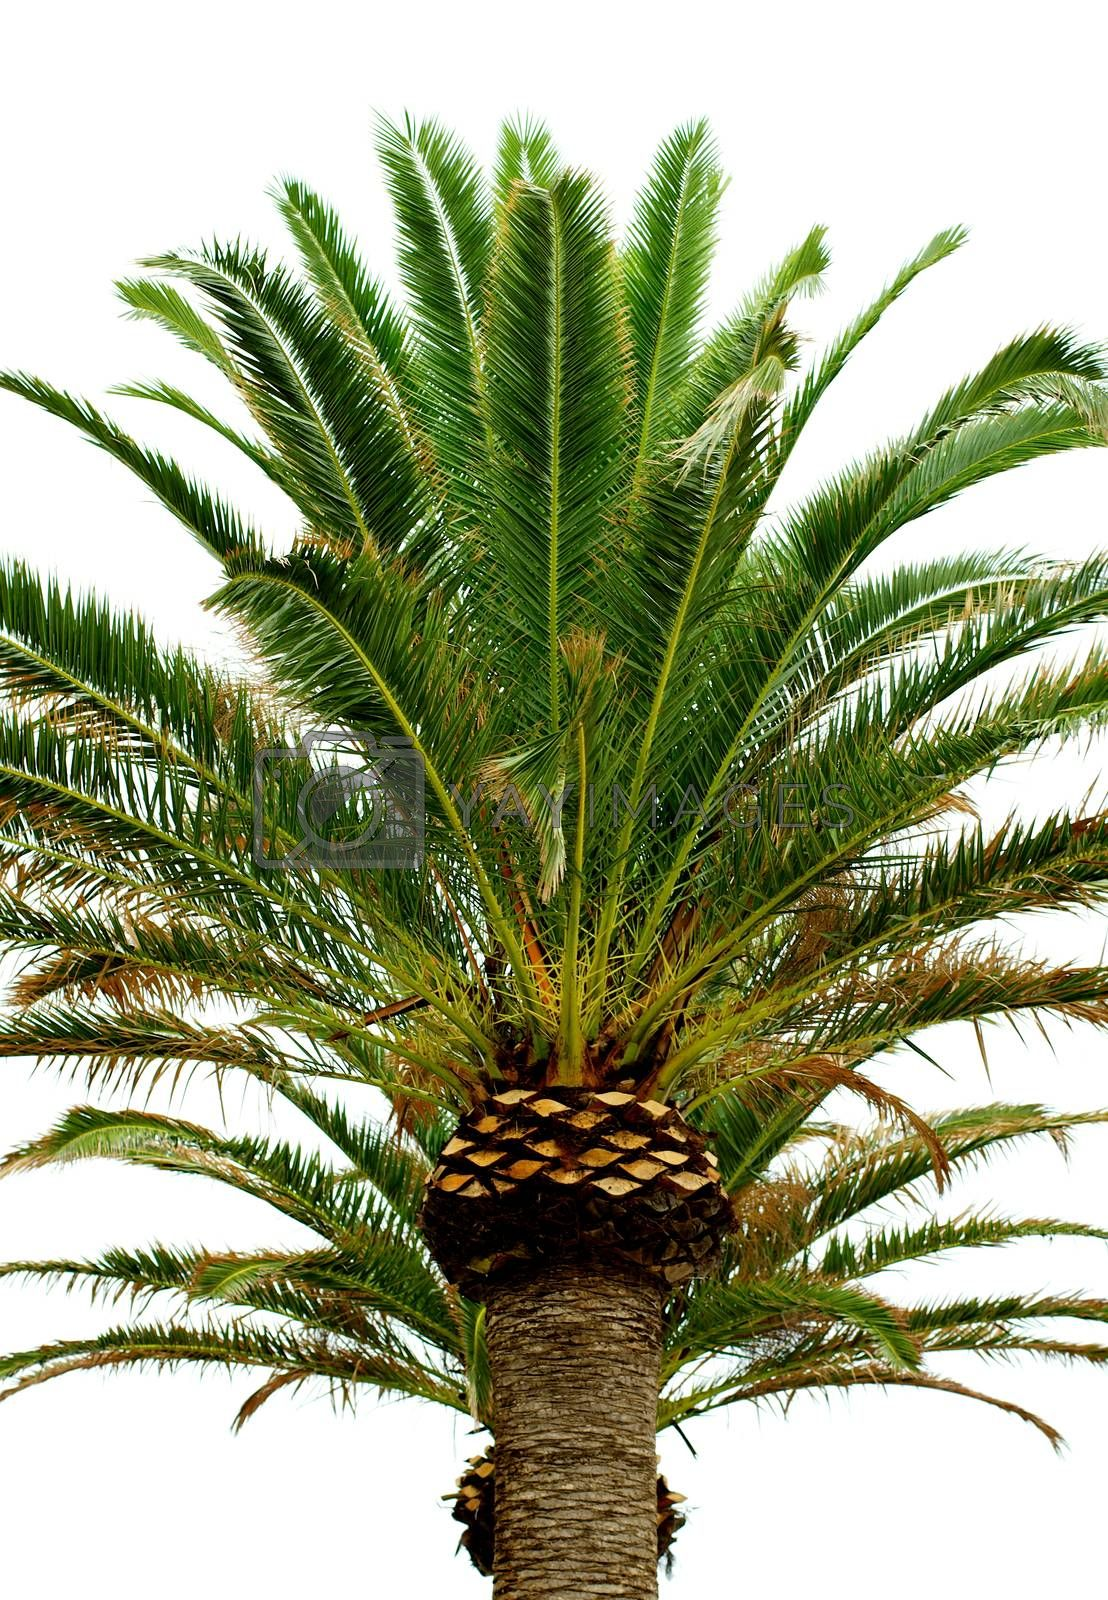 Royalty free image of Palm Tree by zhekos